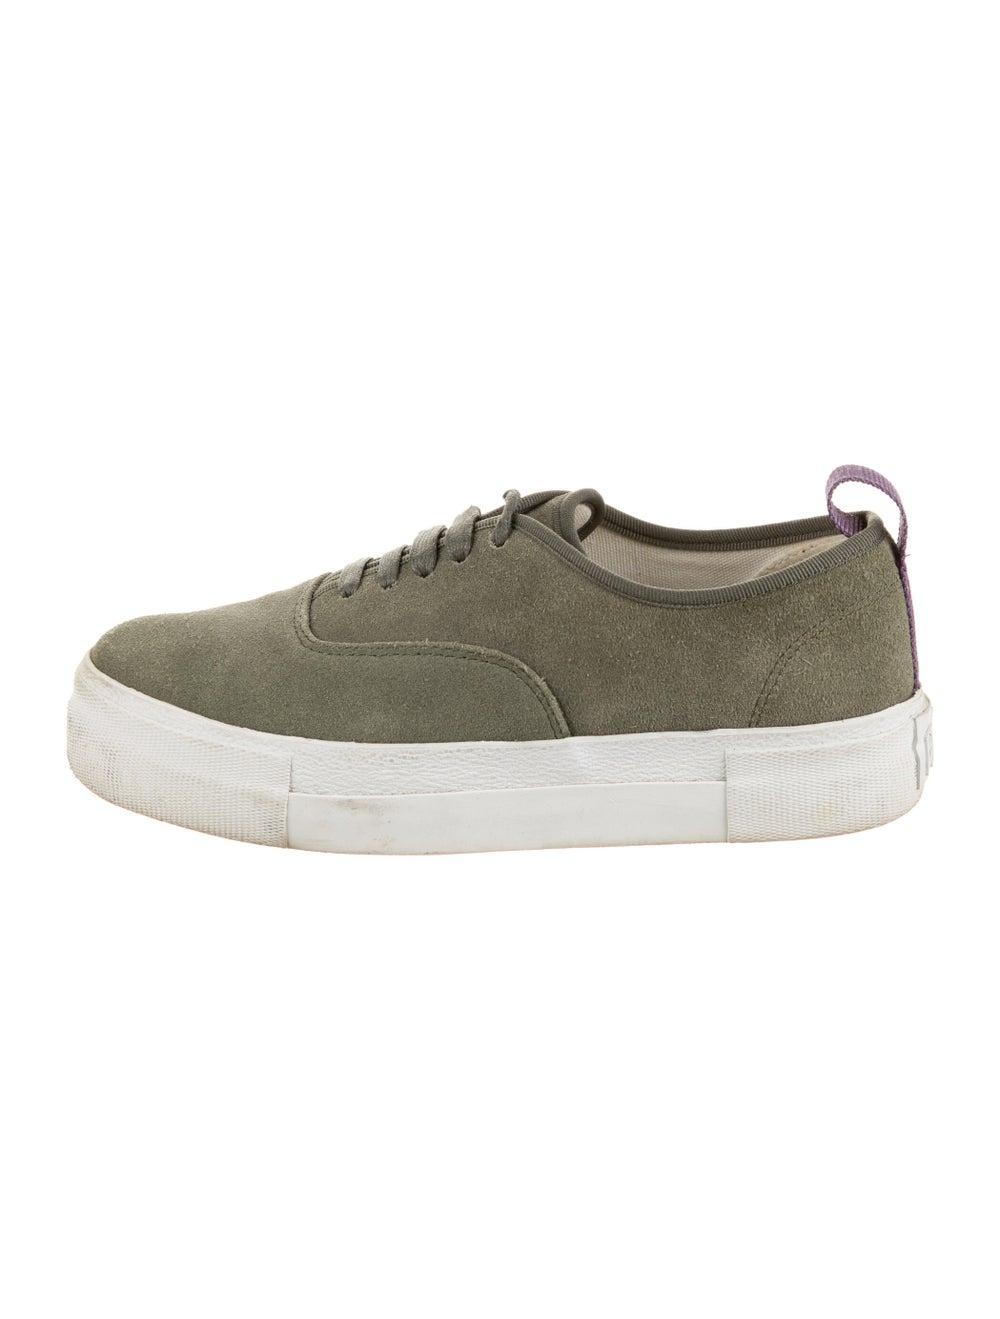 Eytys Suede Sneakers Green - image 1